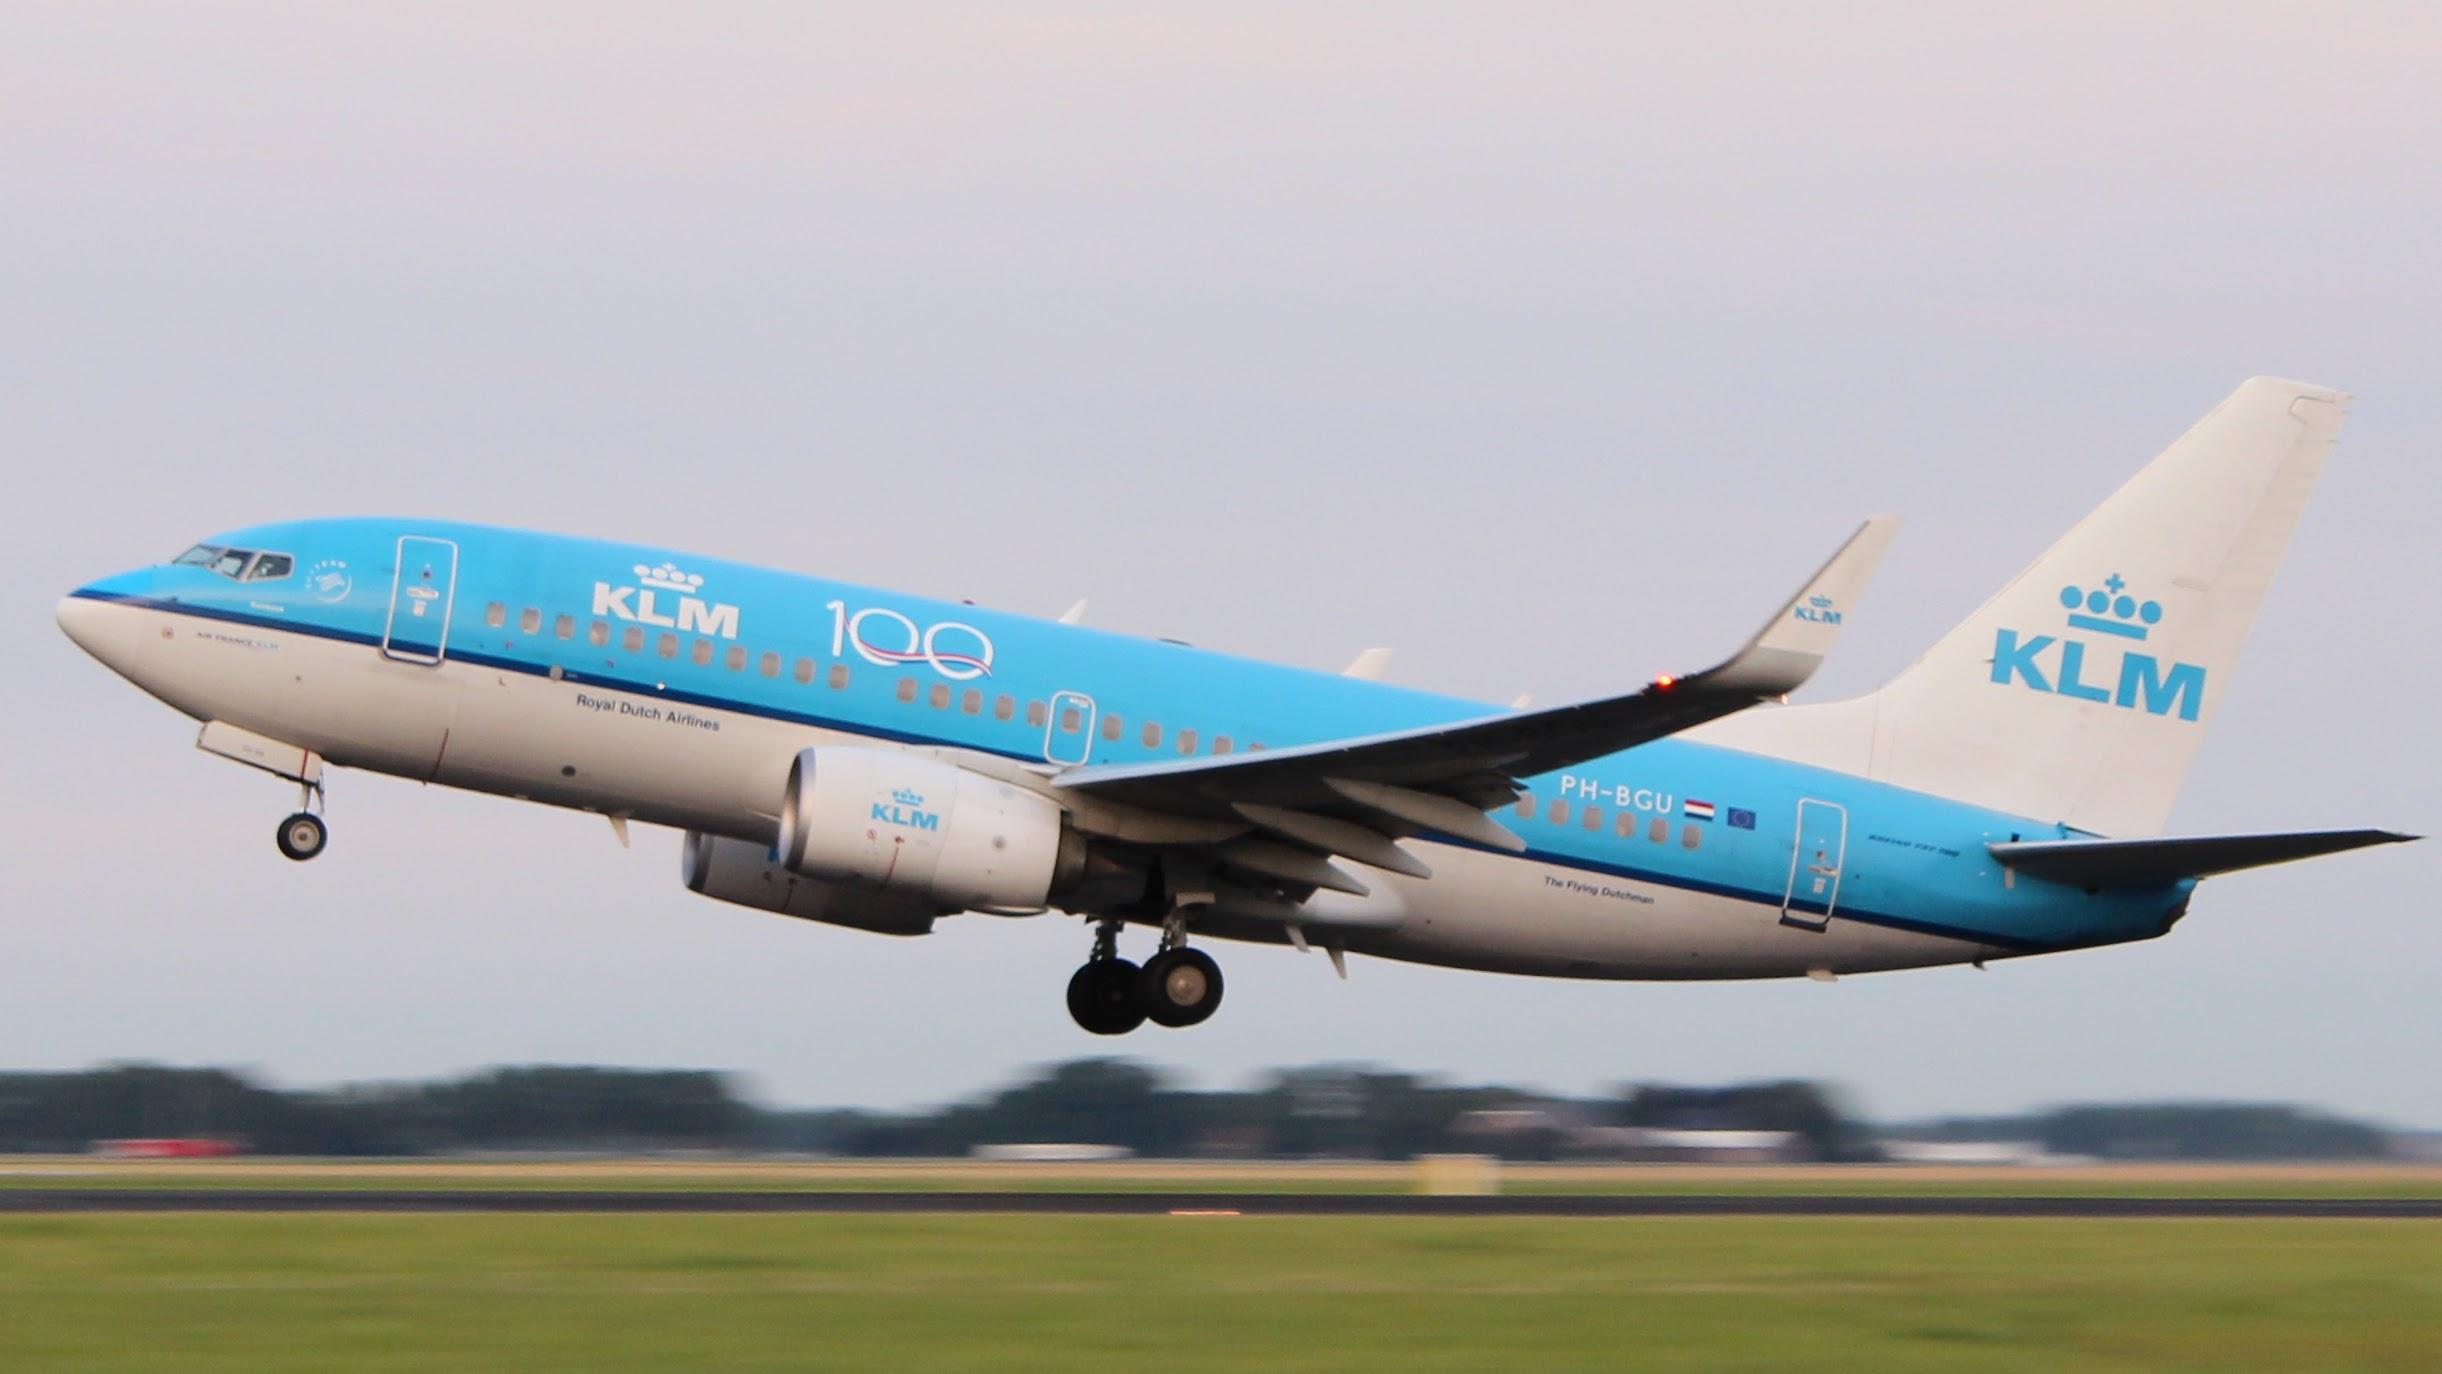 KLM — #2 Airline Facebook Ranking